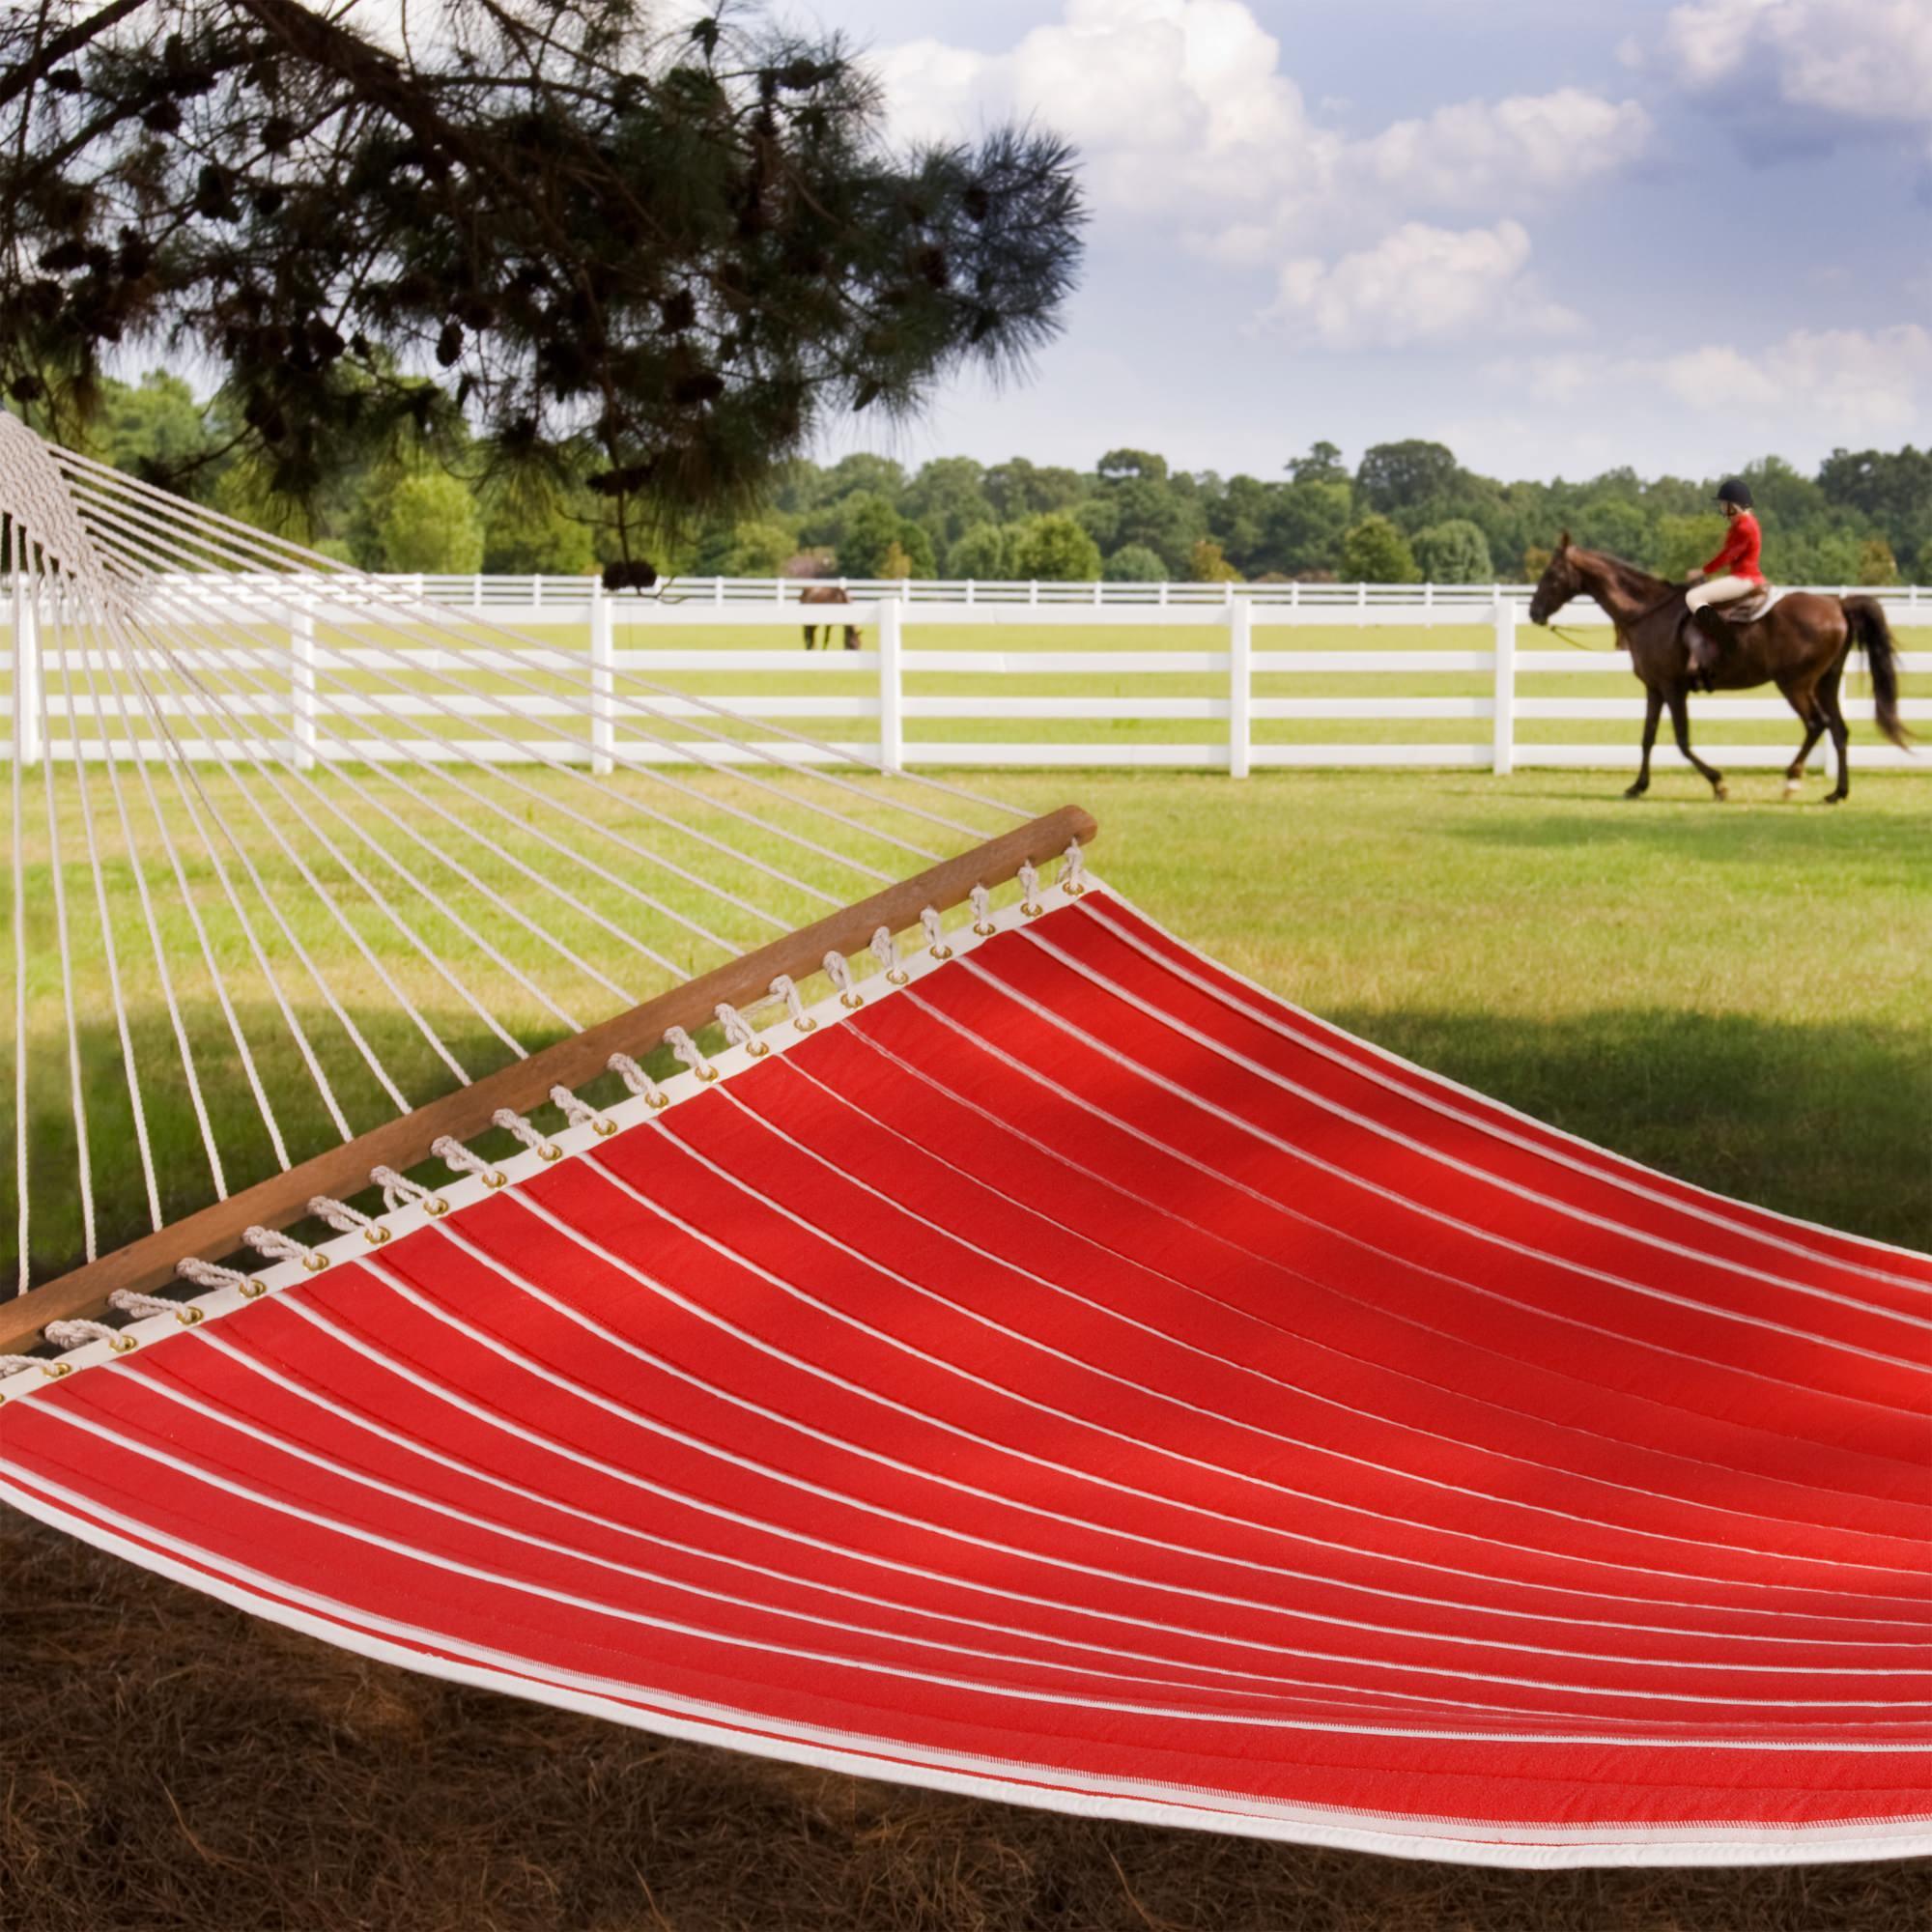 Hatteras Hammocks Classic Red Stripe Quilted Hammock